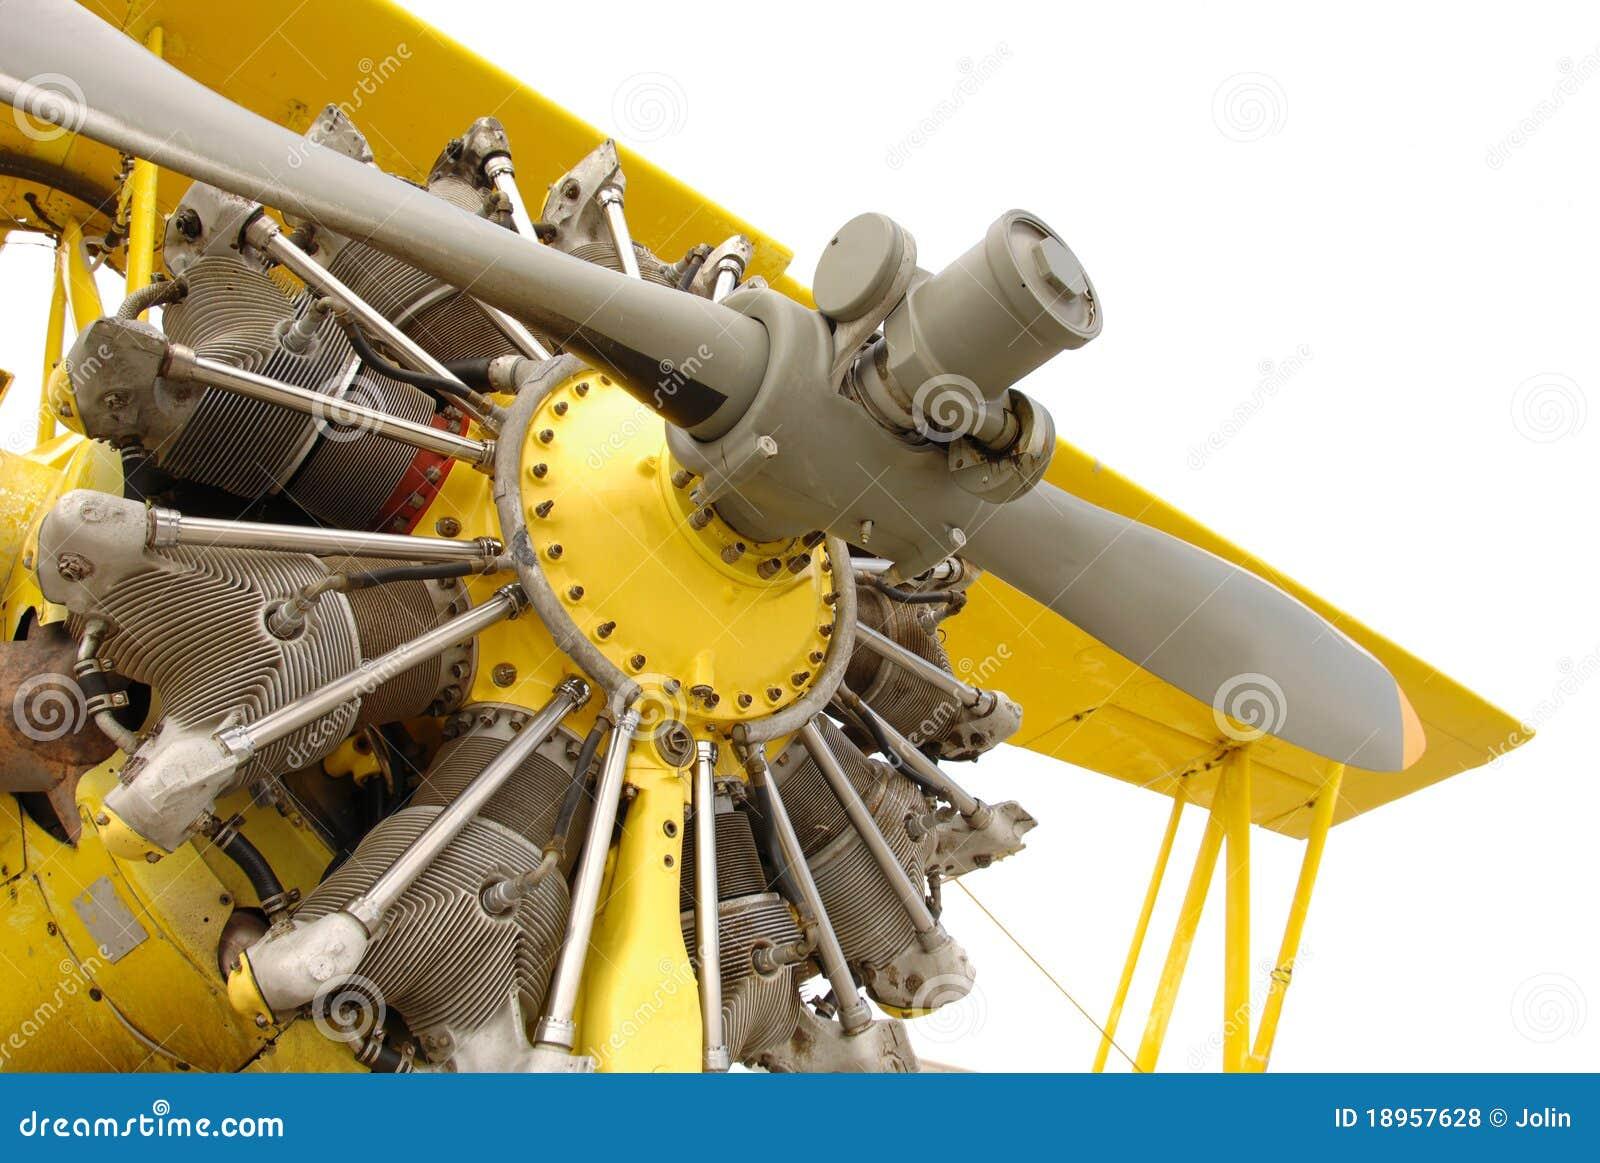 Vintage Aircraft Engines 52